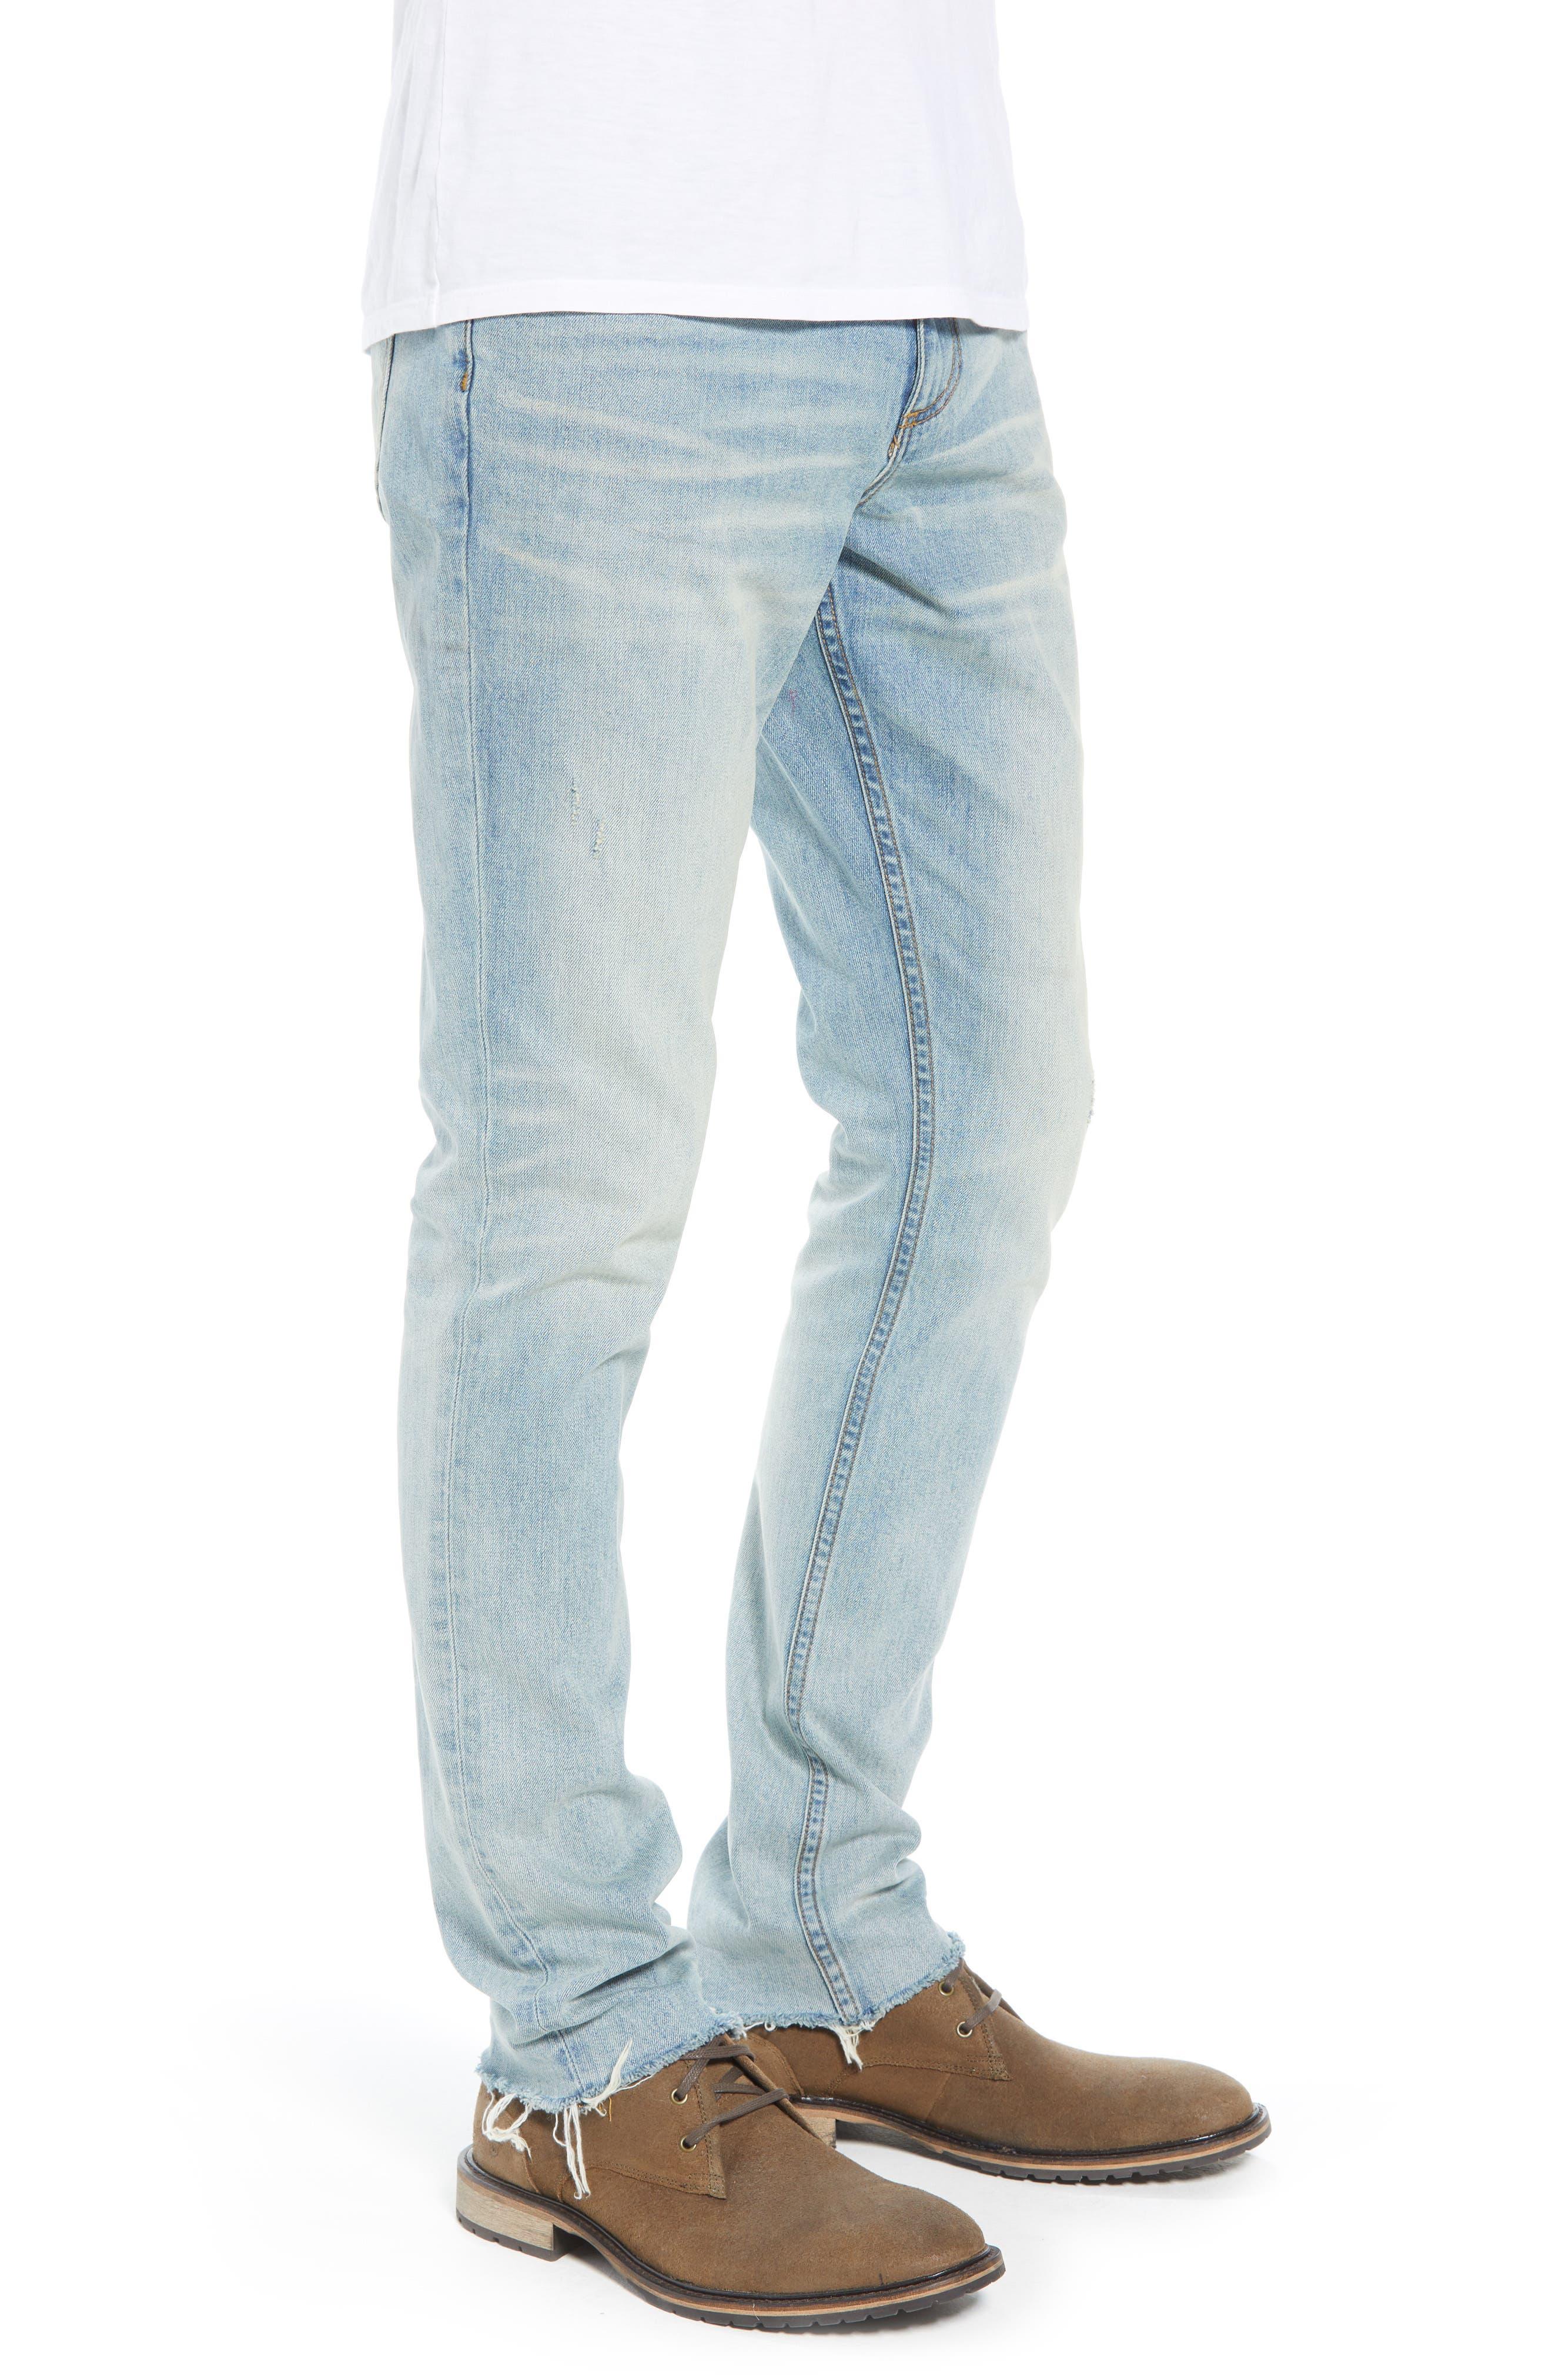 Slim Fit Jeans,                             Alternate thumbnail 3, color,                             BLUE FADED LIGHT WASH